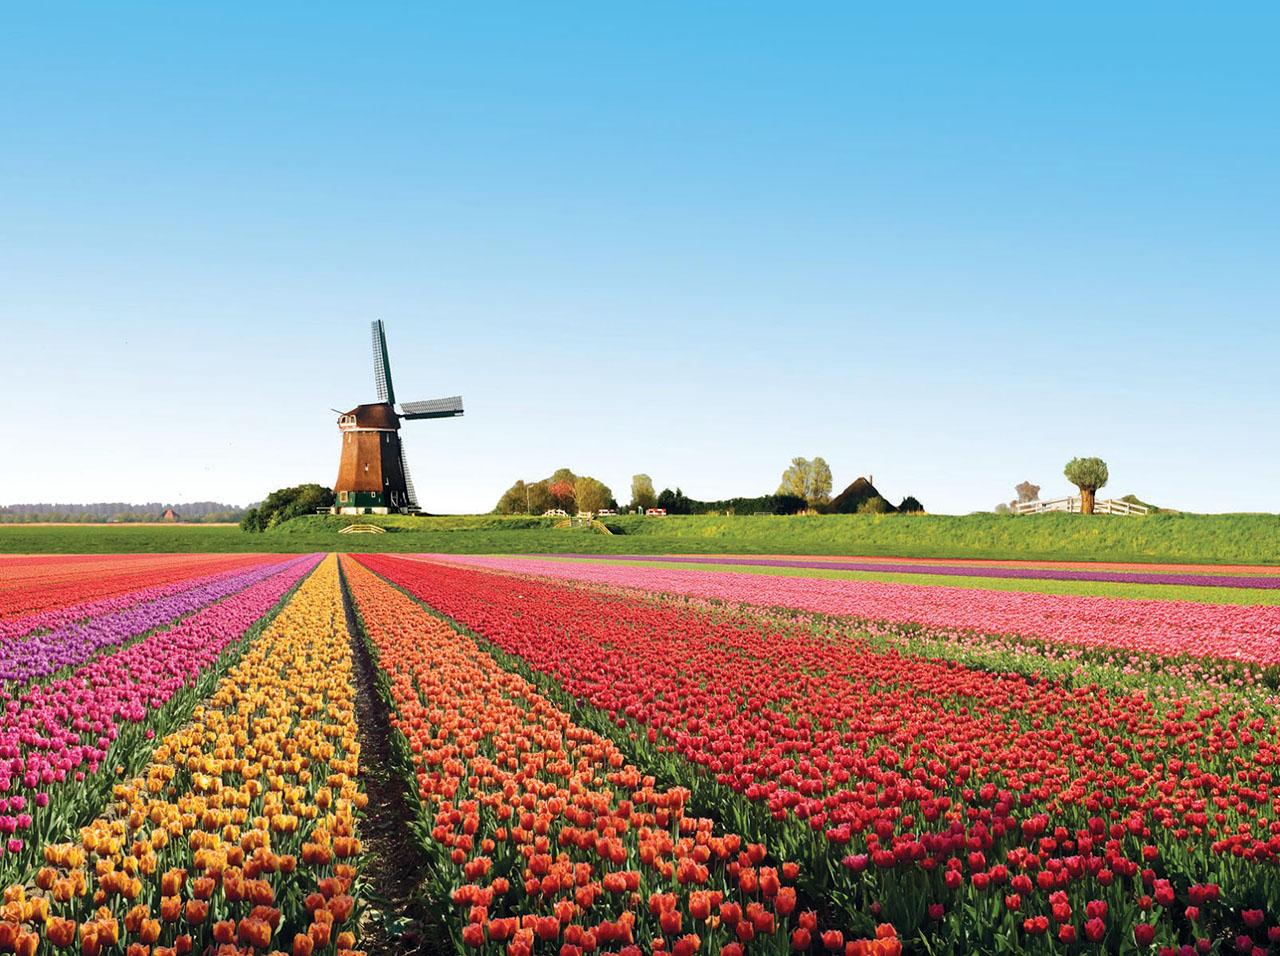 Champs-de-tulipes-Alkmaar-Pays-Bas-photo-01